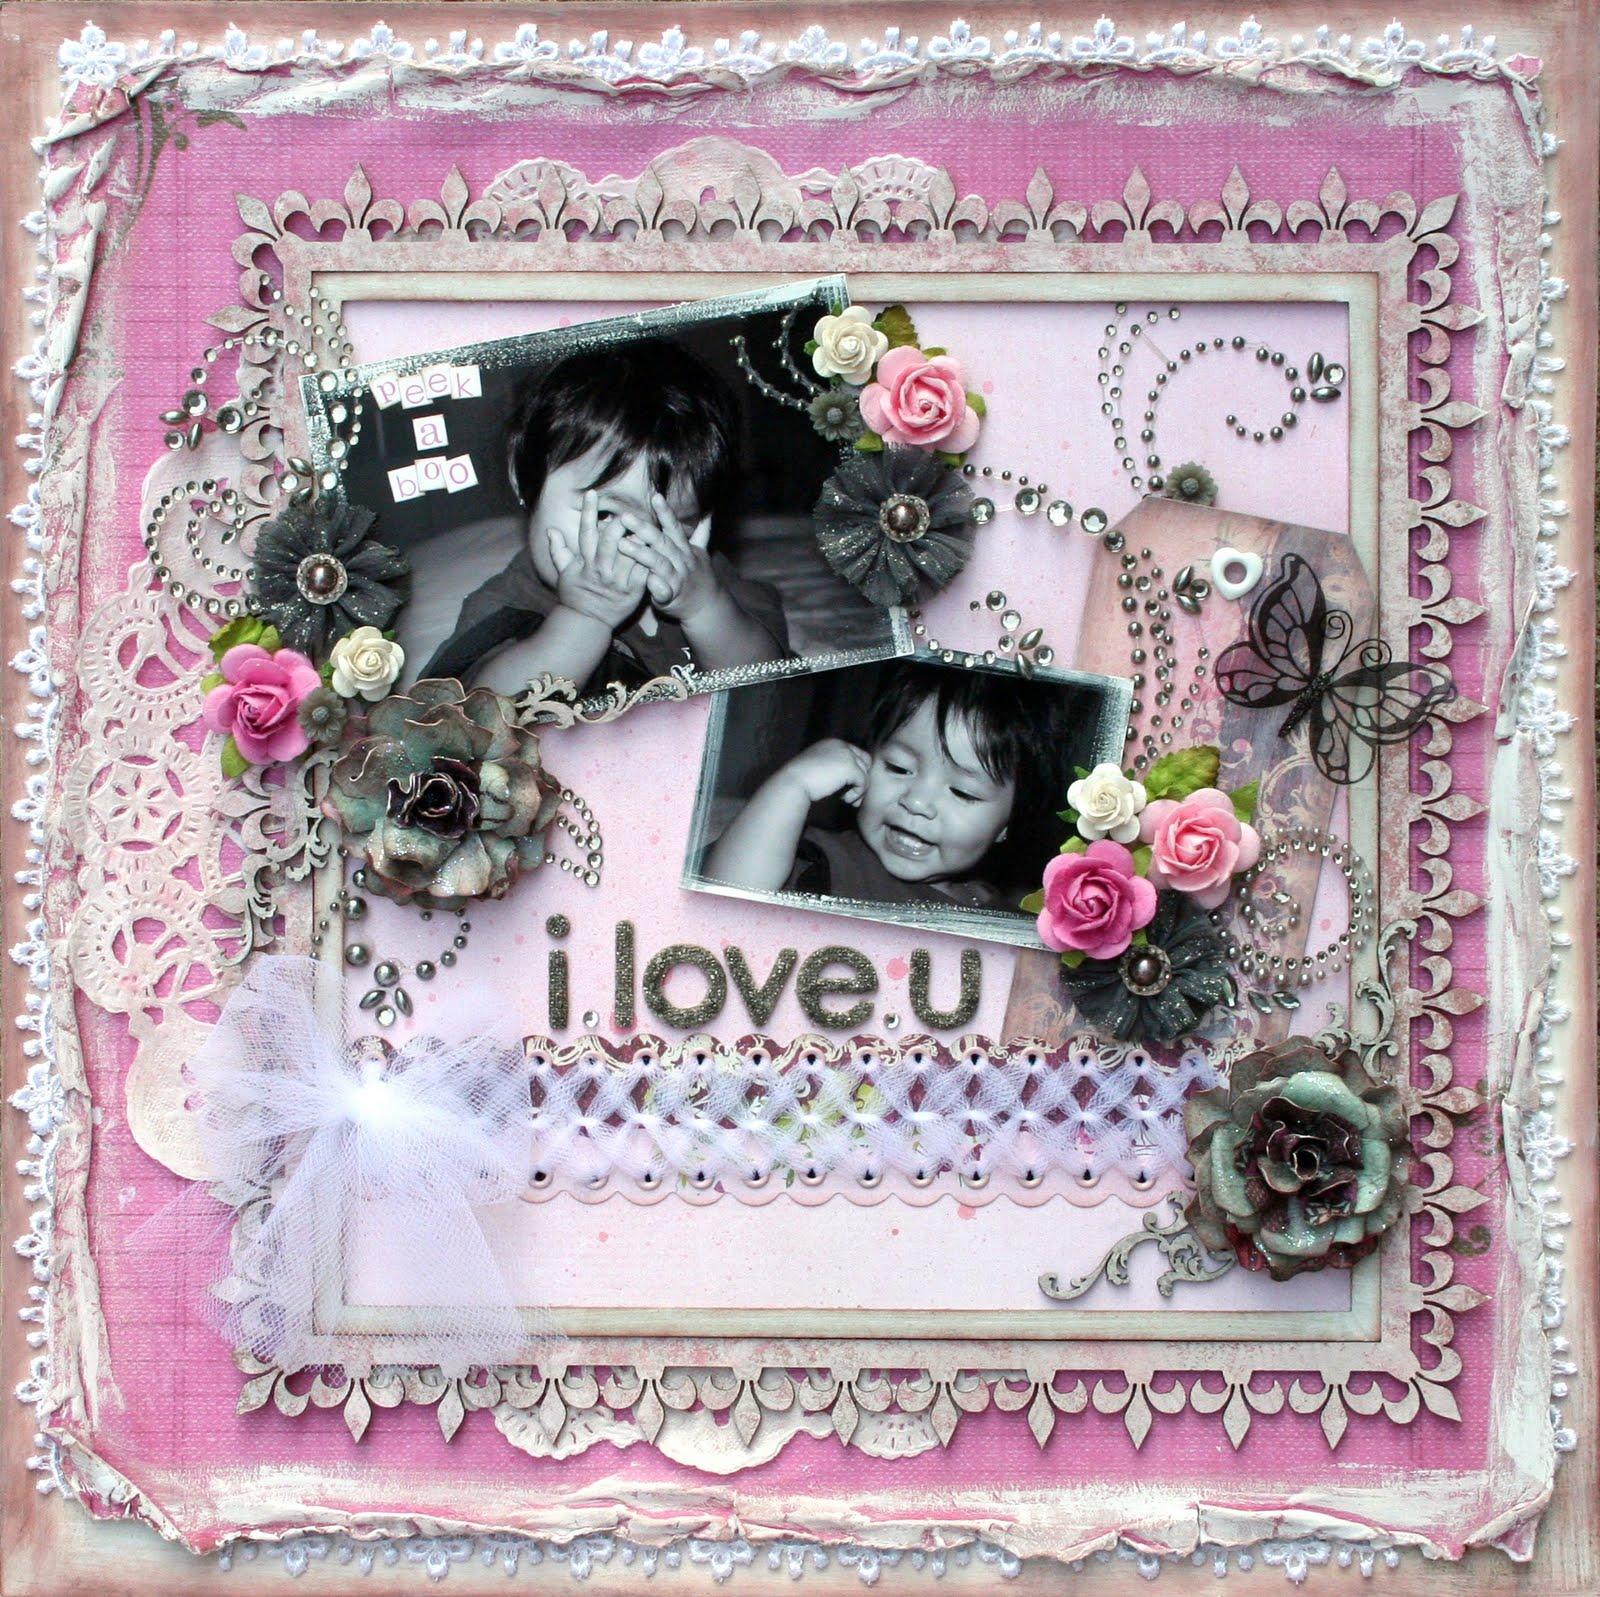 at www choti24 com dhaka choti choti golpo bangla love story